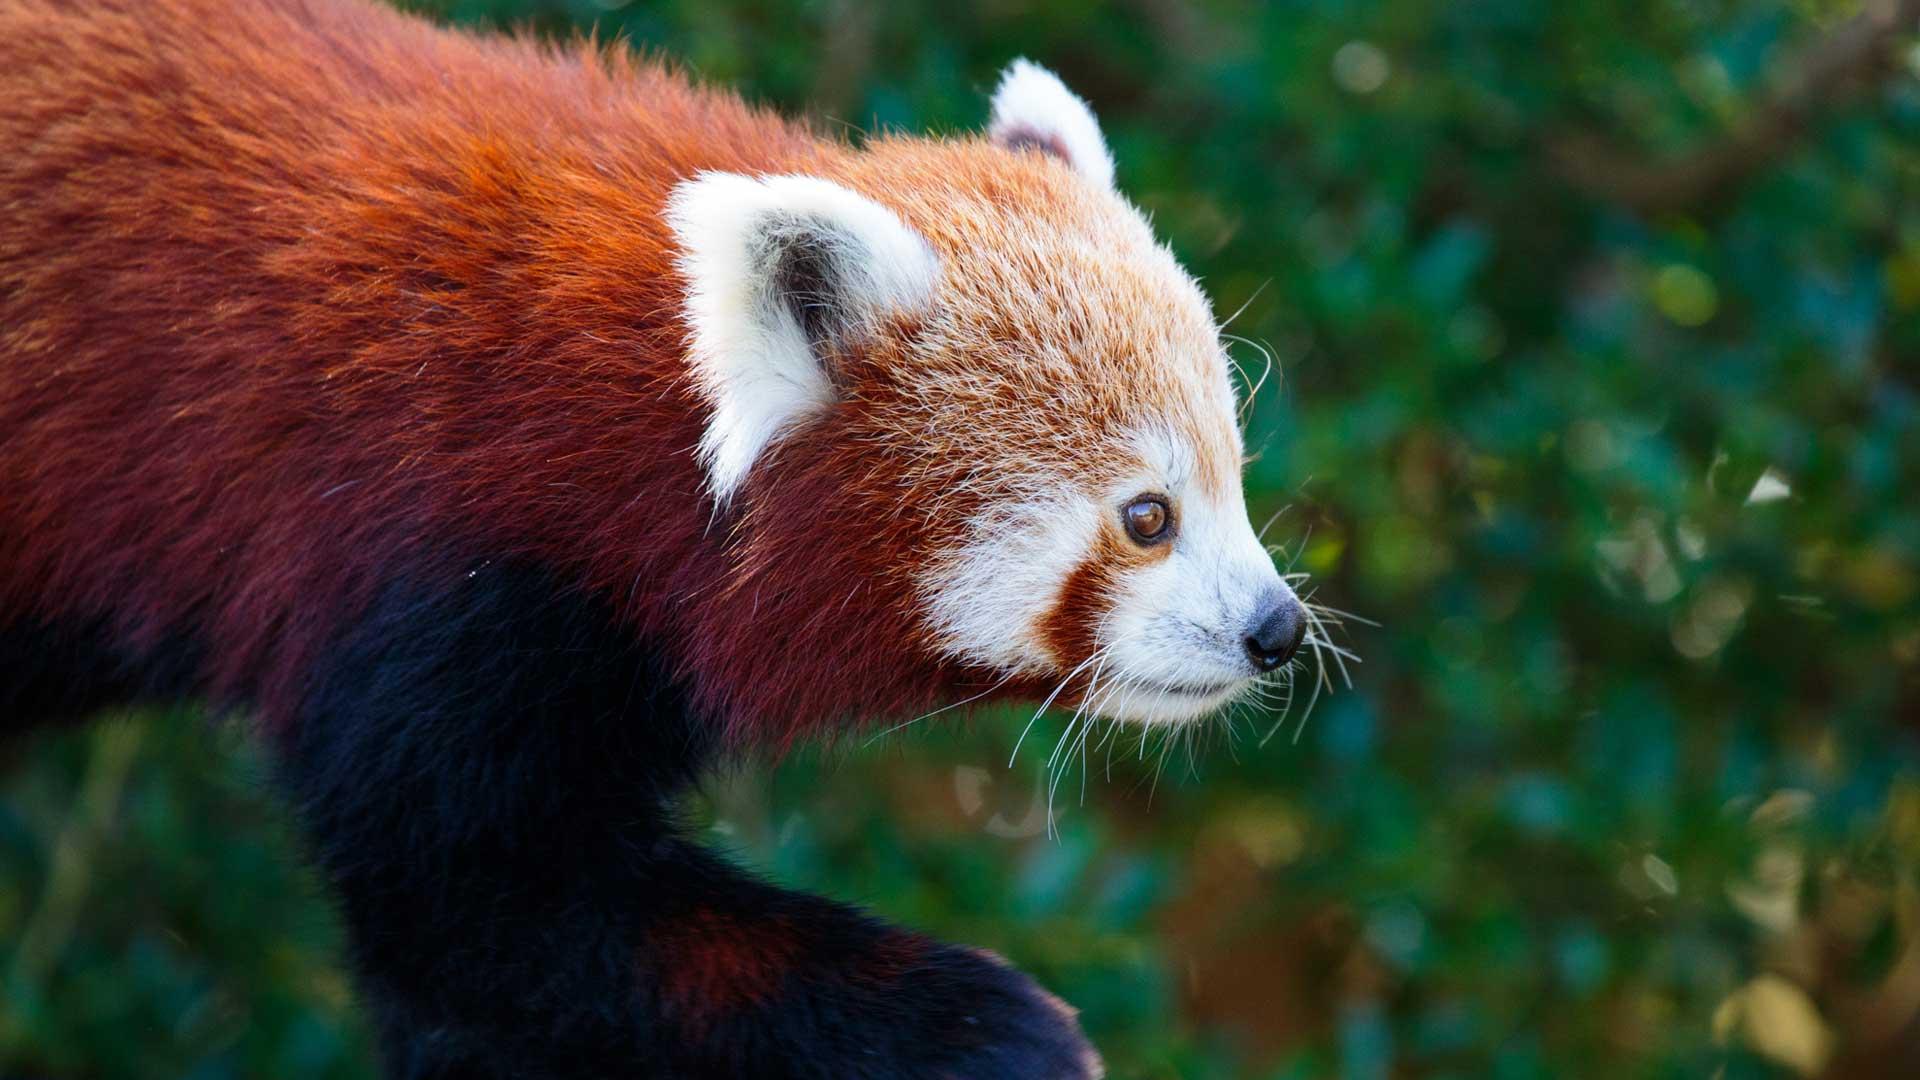 https://rfacdn.nz/zoo/assets/media/red-panda-gallery-2.jpg